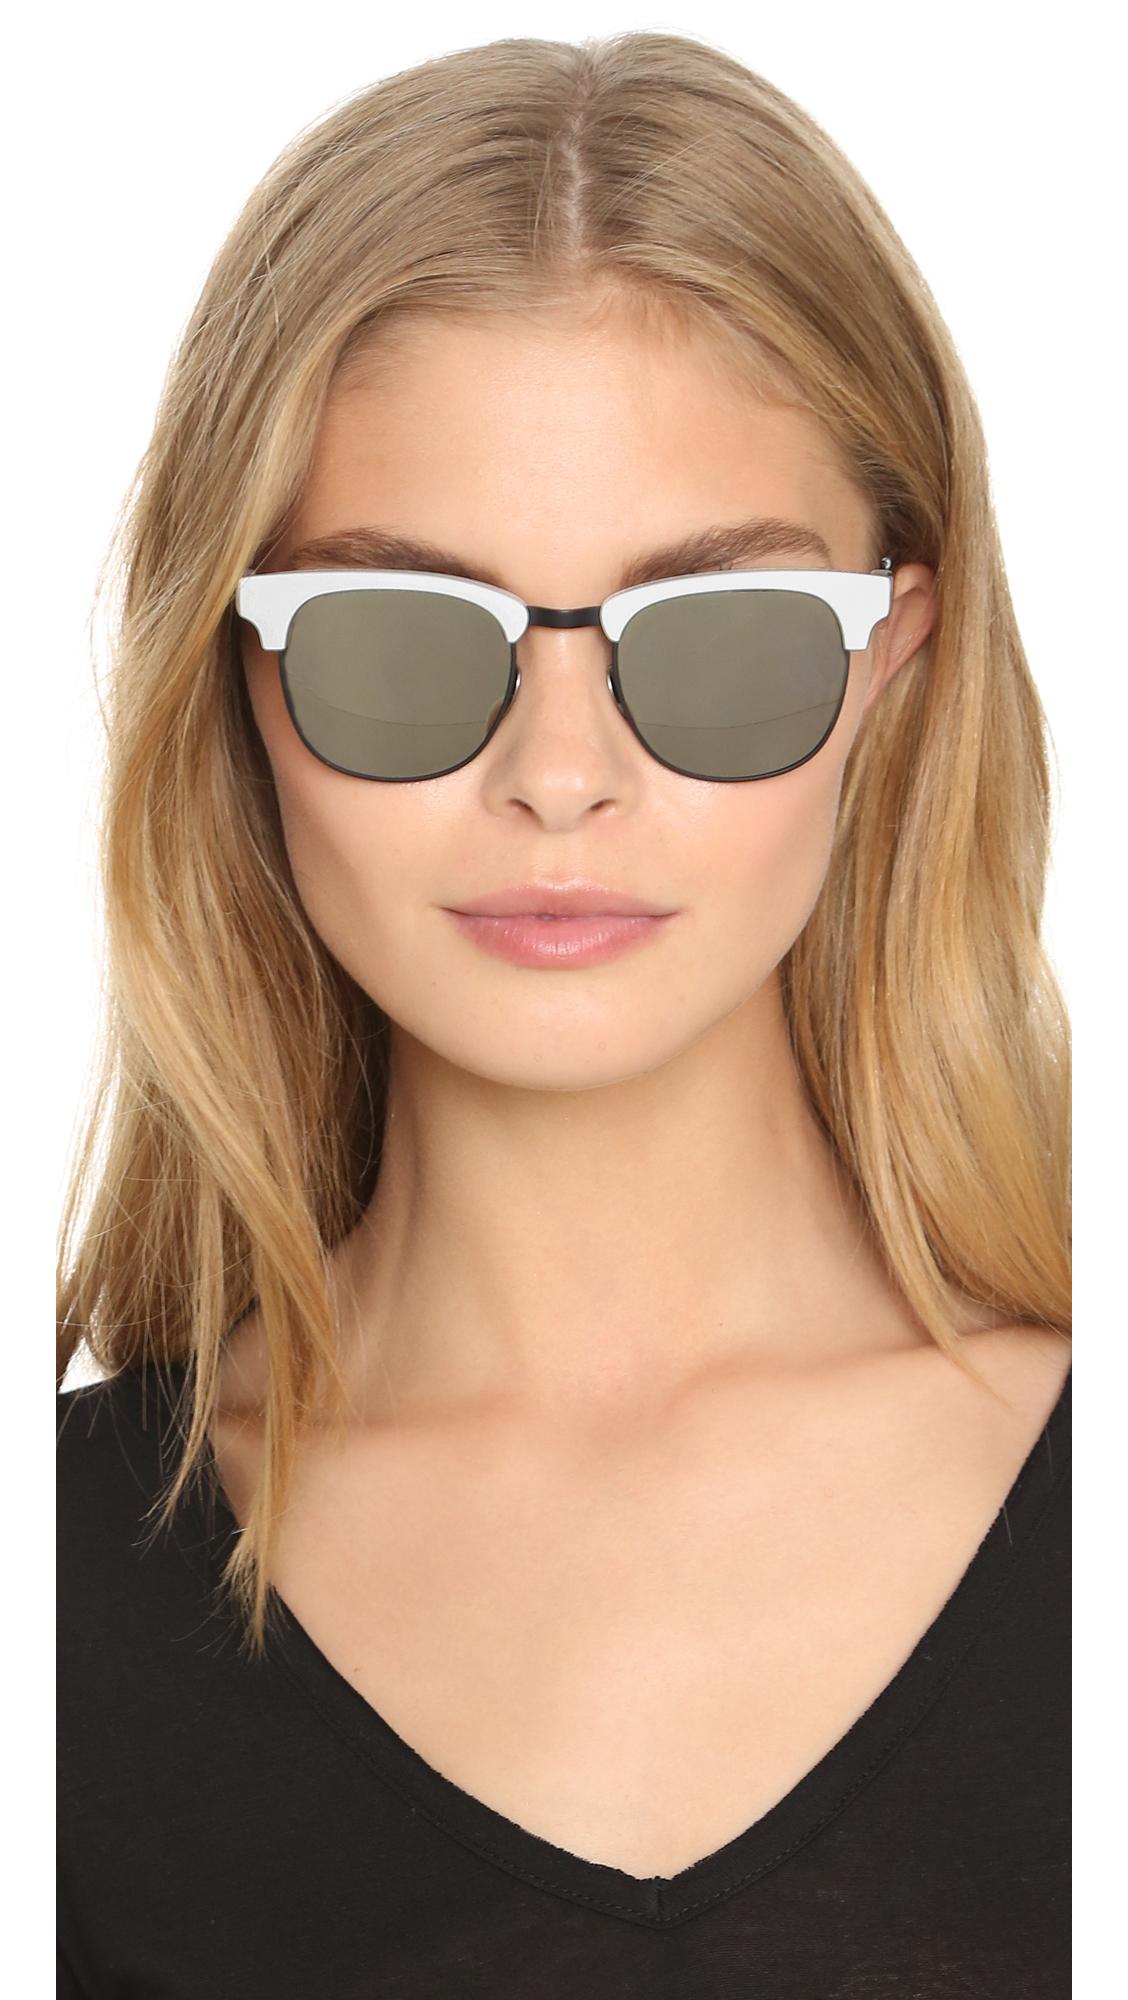 8c5fc8c622b Lyst - Westward Leaning Vanguard 11 Sunglasses in Gray